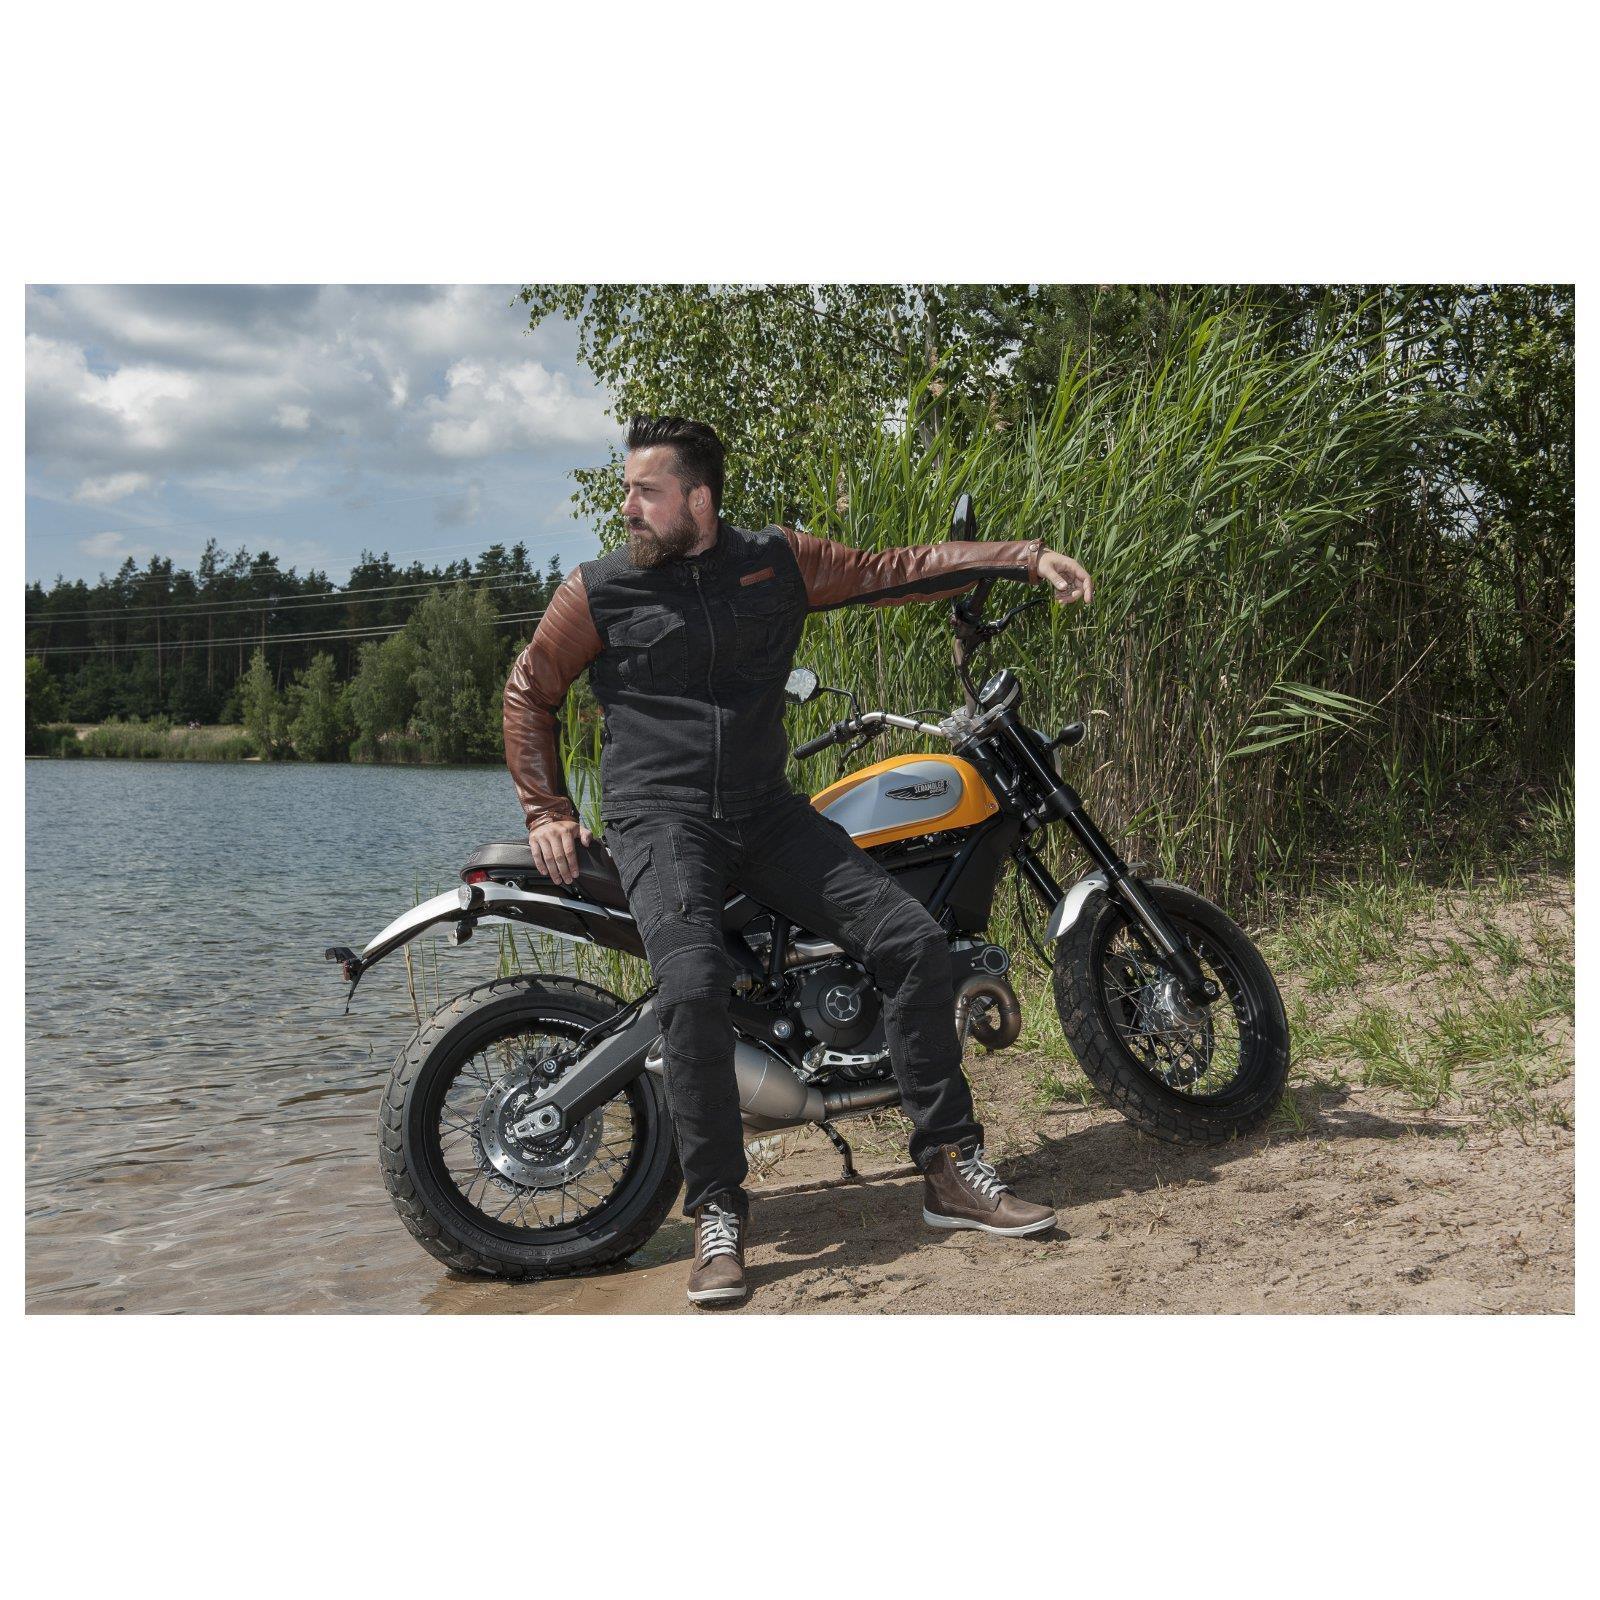 Trilobite Acid interferenzaNverso UOMO JEANS DA MOTO MOTO MOTO NERO PROTEZIONI pantaloni aramide 20aa01